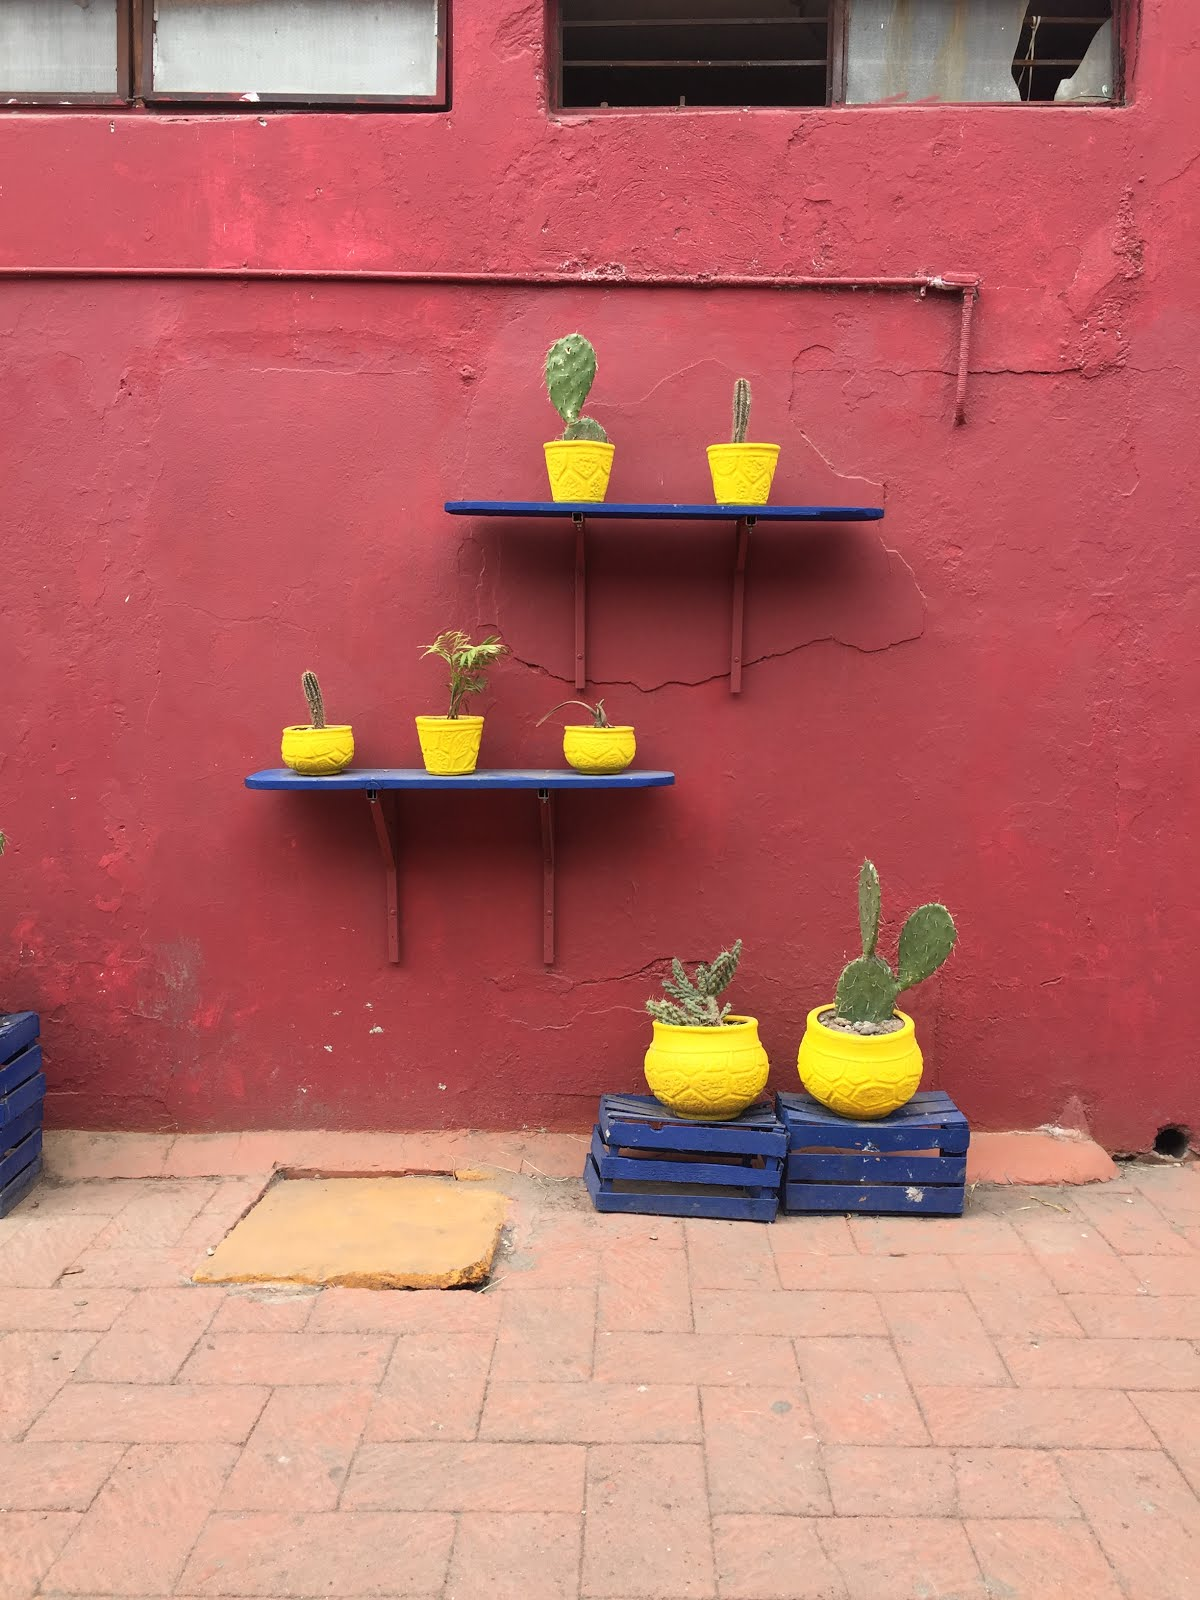 la callejon del arte une rue artistique à ciudad obregon